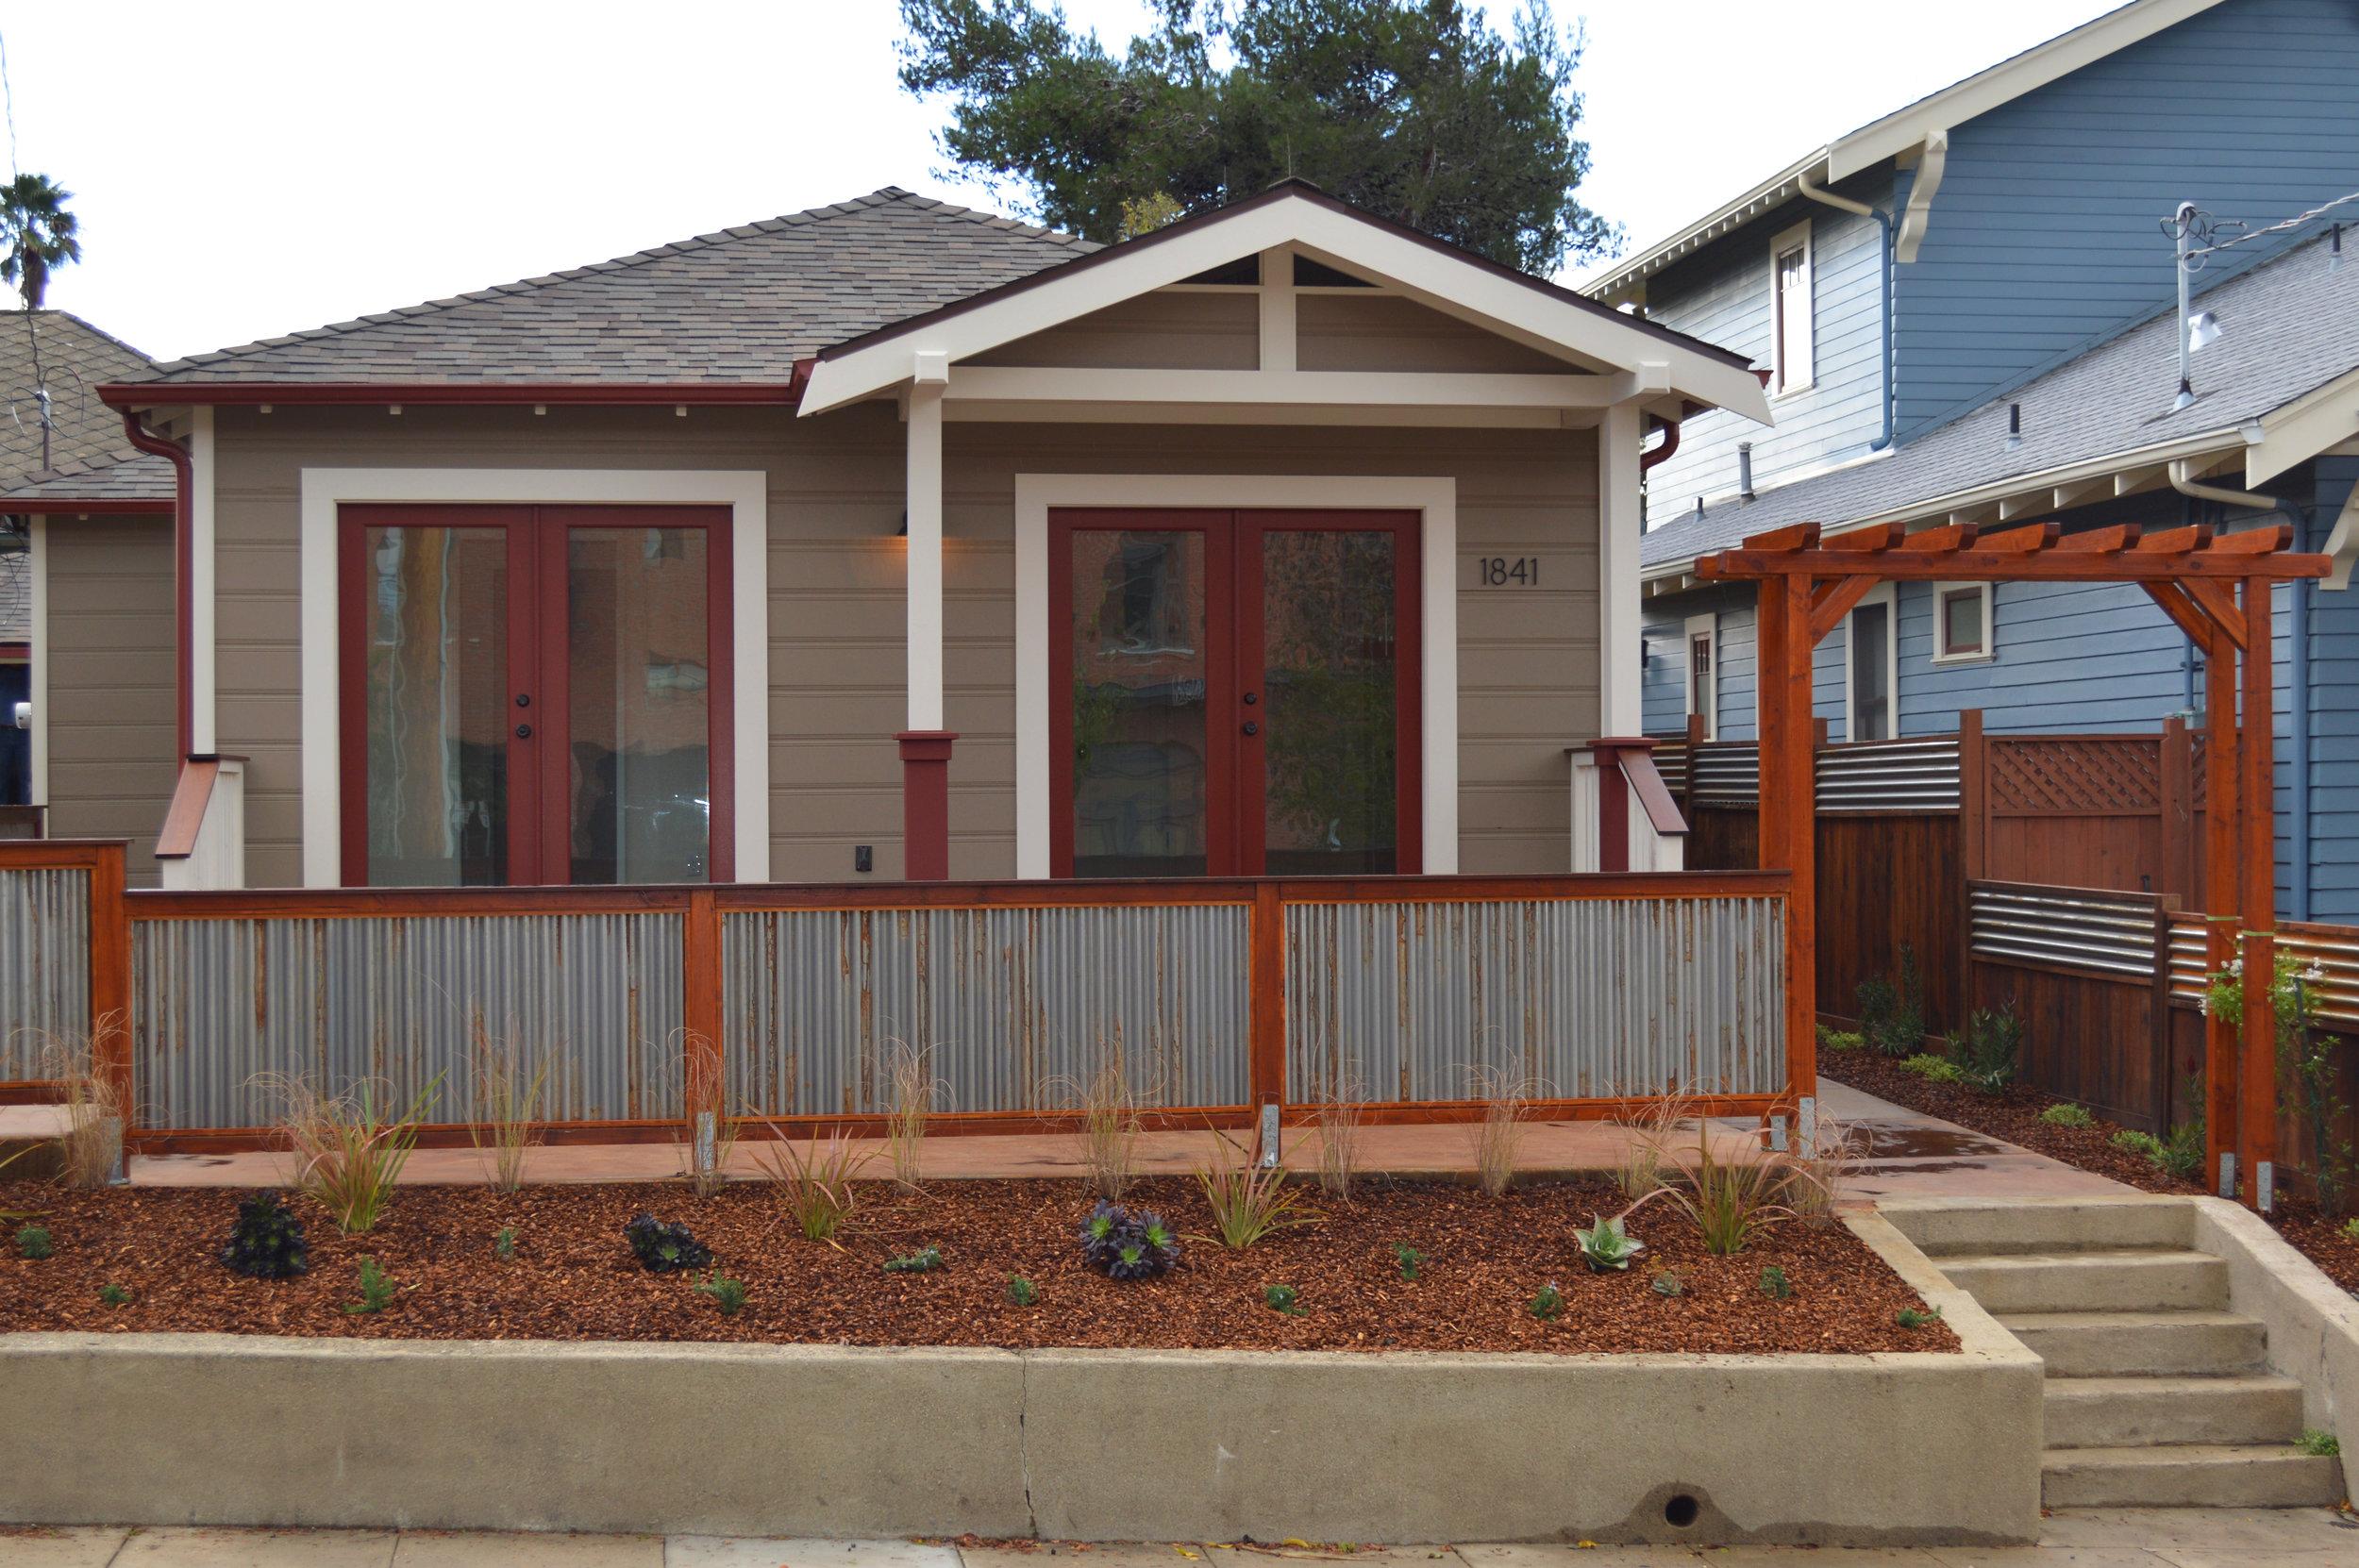 San Luis Obispo Landscape Design and Construction SLO Craftsman